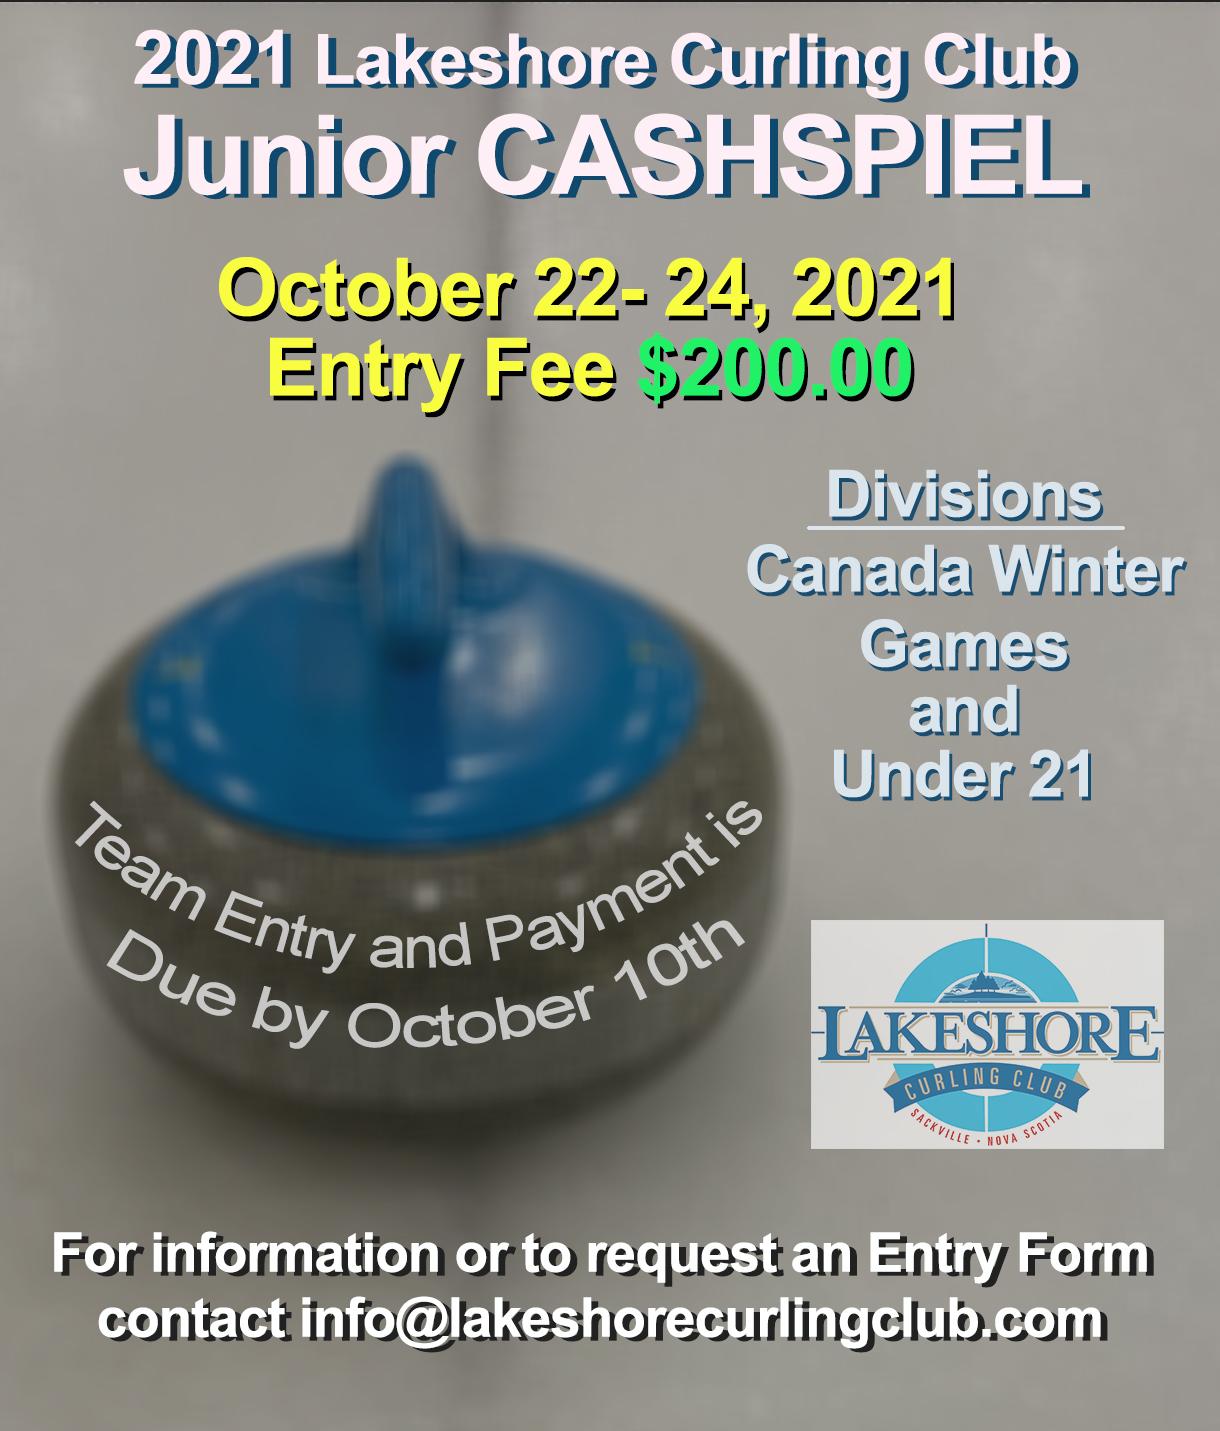 Lakeshore NS Junior Cashspiel @ Lakeshore Curling Club